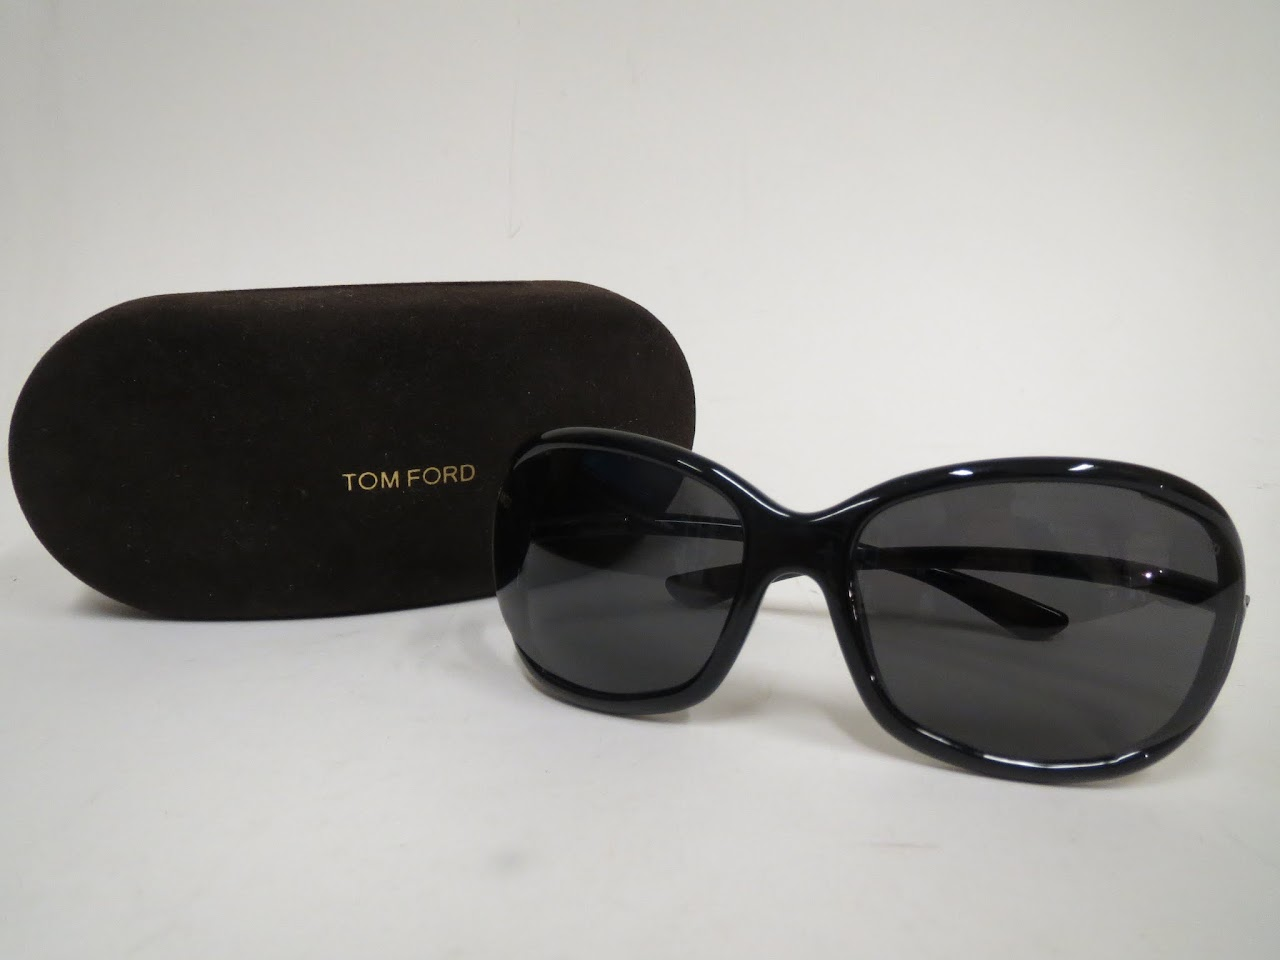 Tom Ford 'Jennifer' Shades